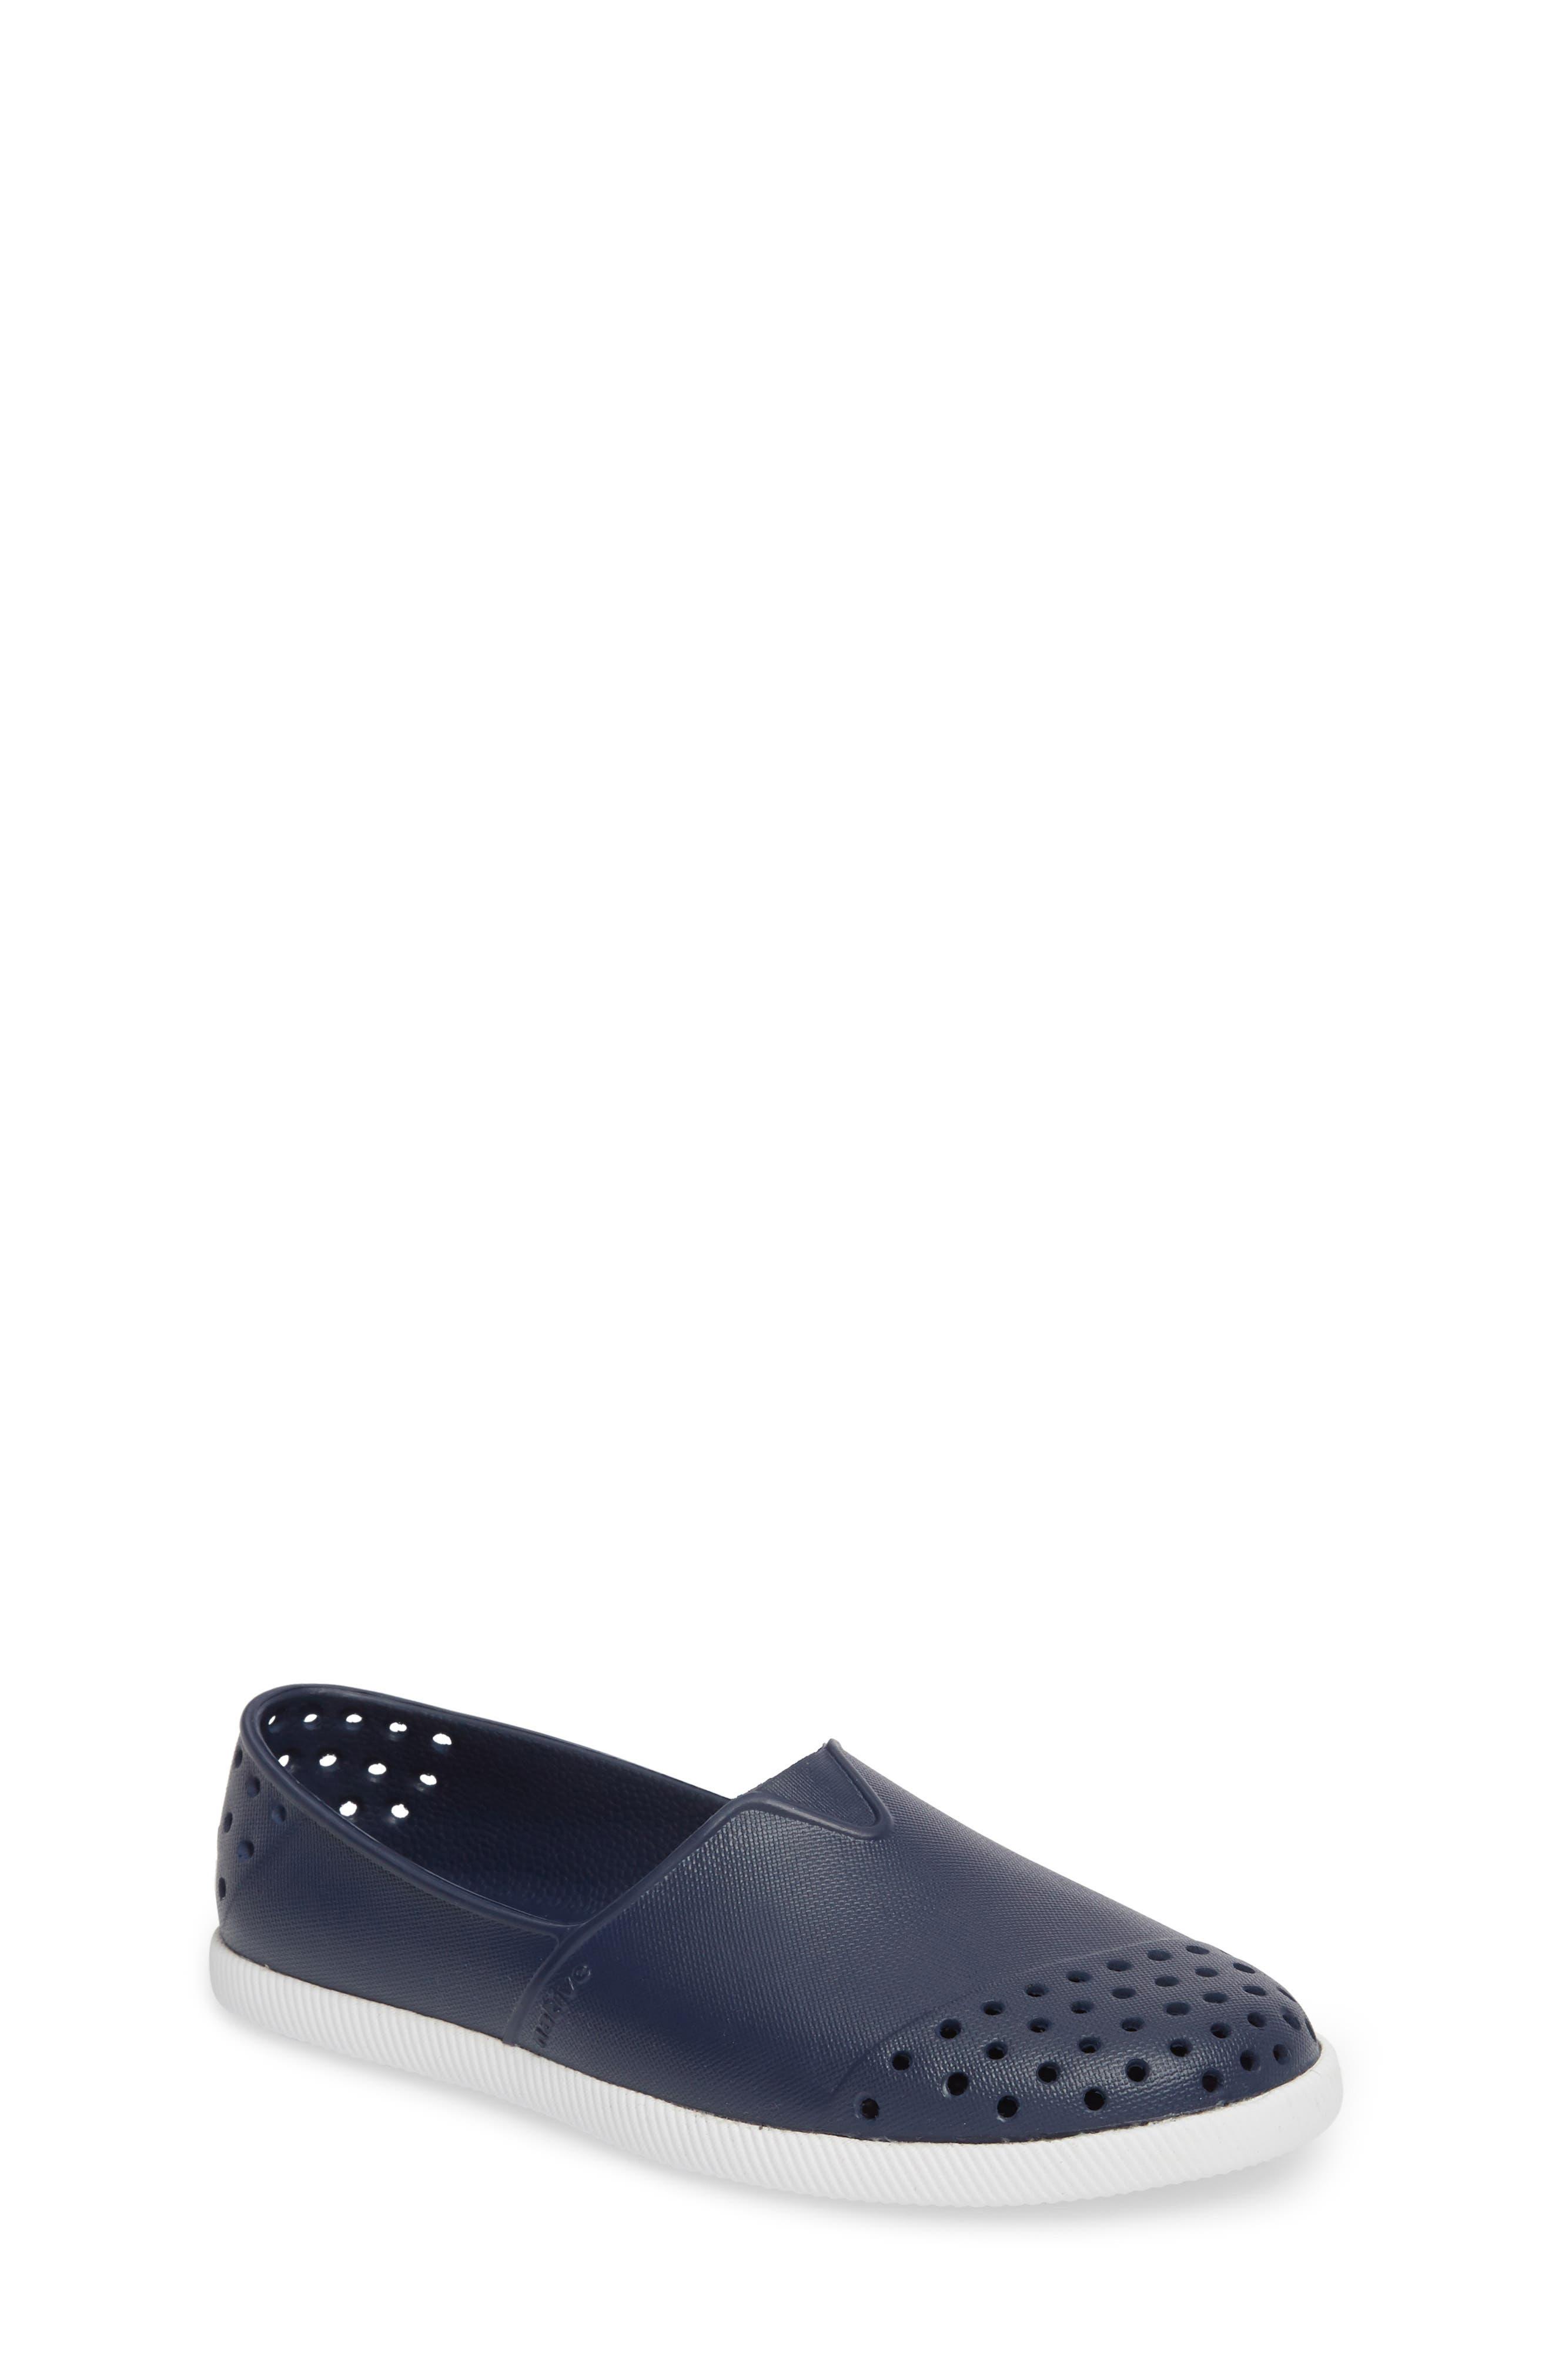 Verona Junior Perforated Slip-On,                         Main,                         color, 414